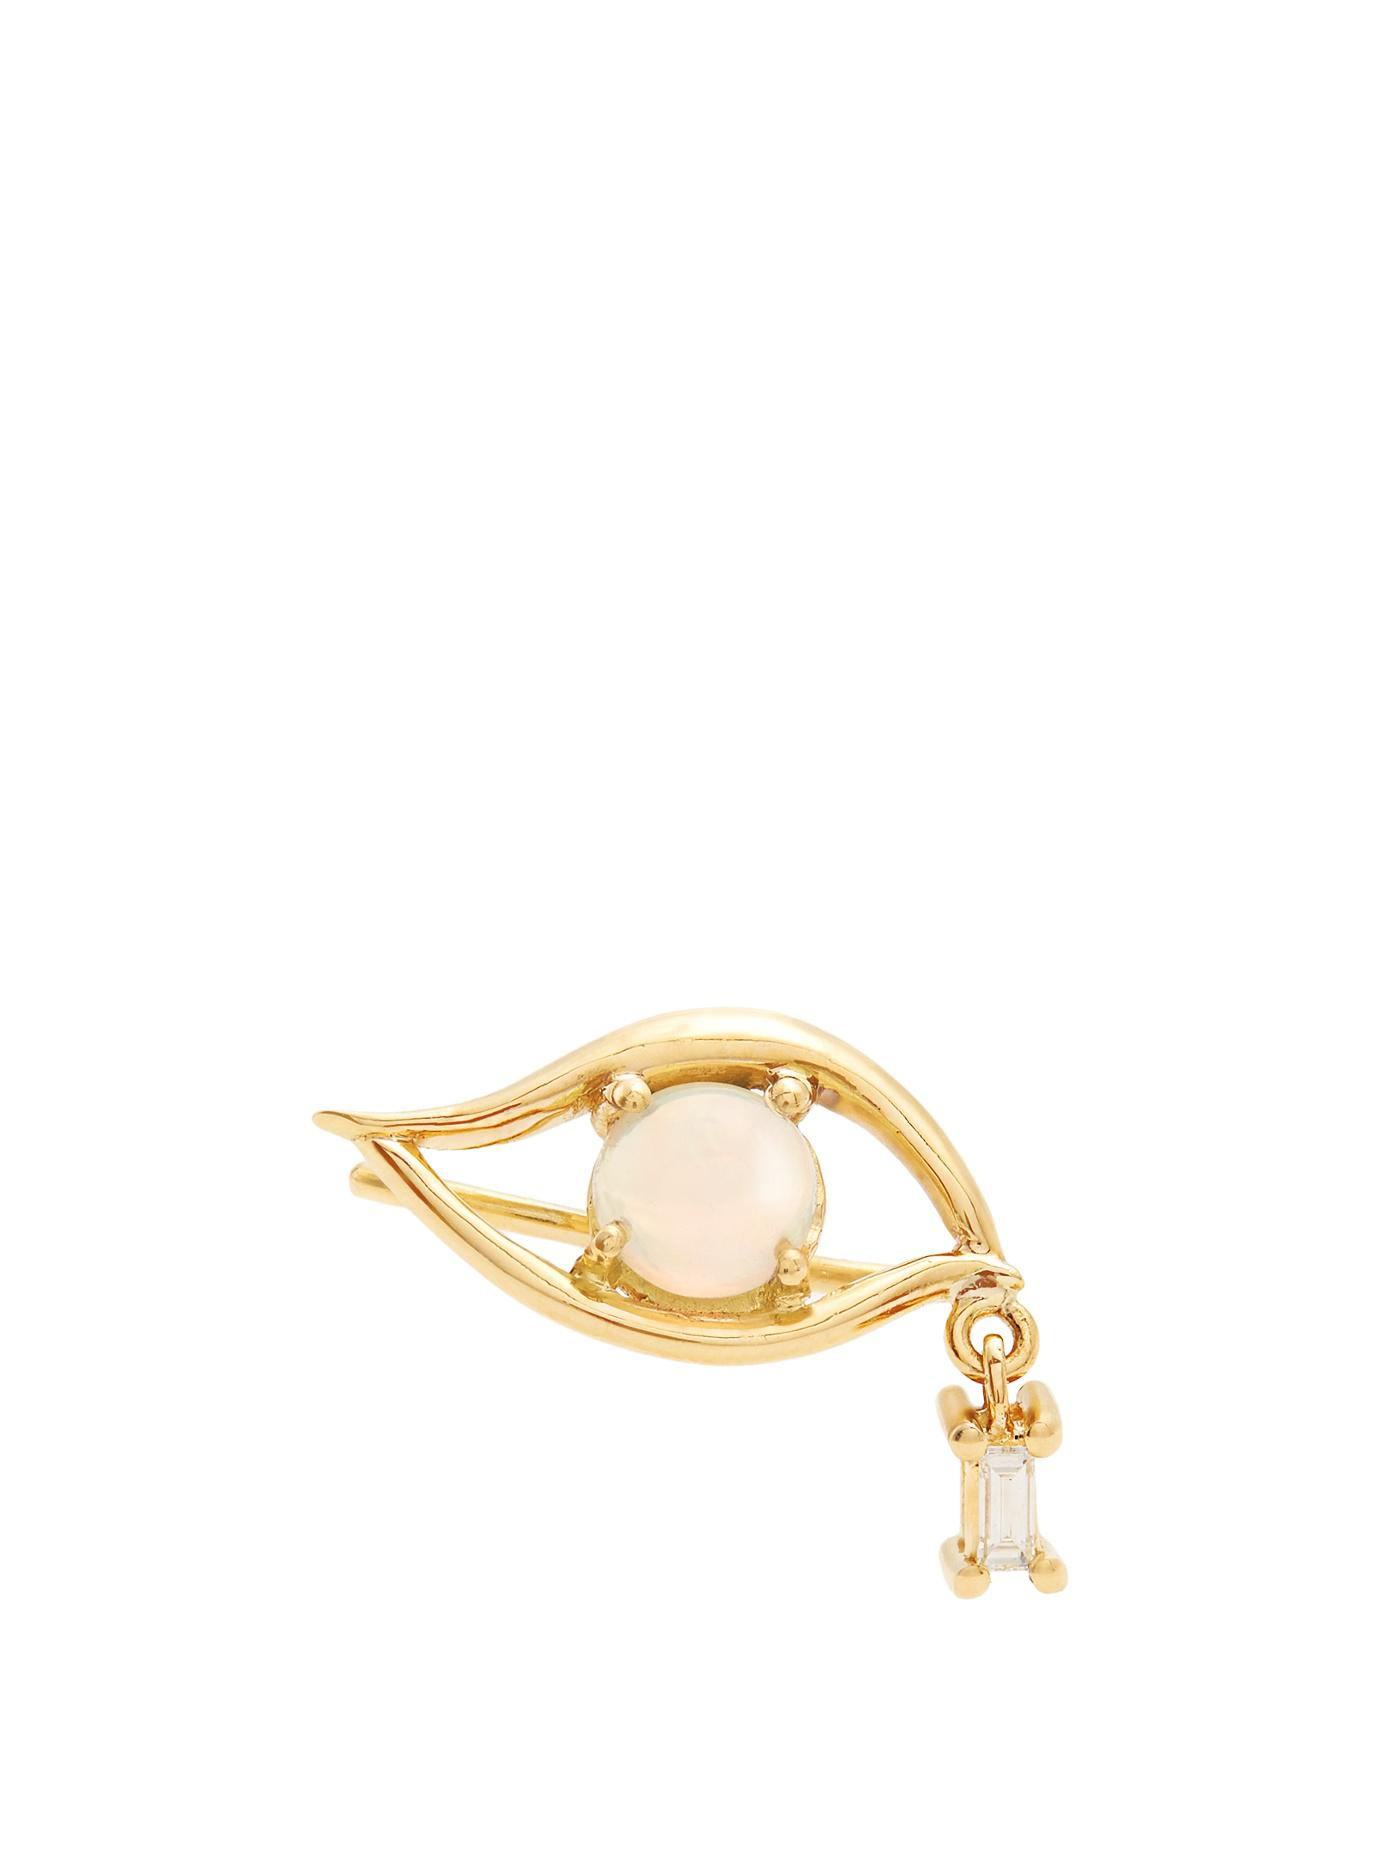 Diamond, emerald & yellow-gold single earring Ileana Makri